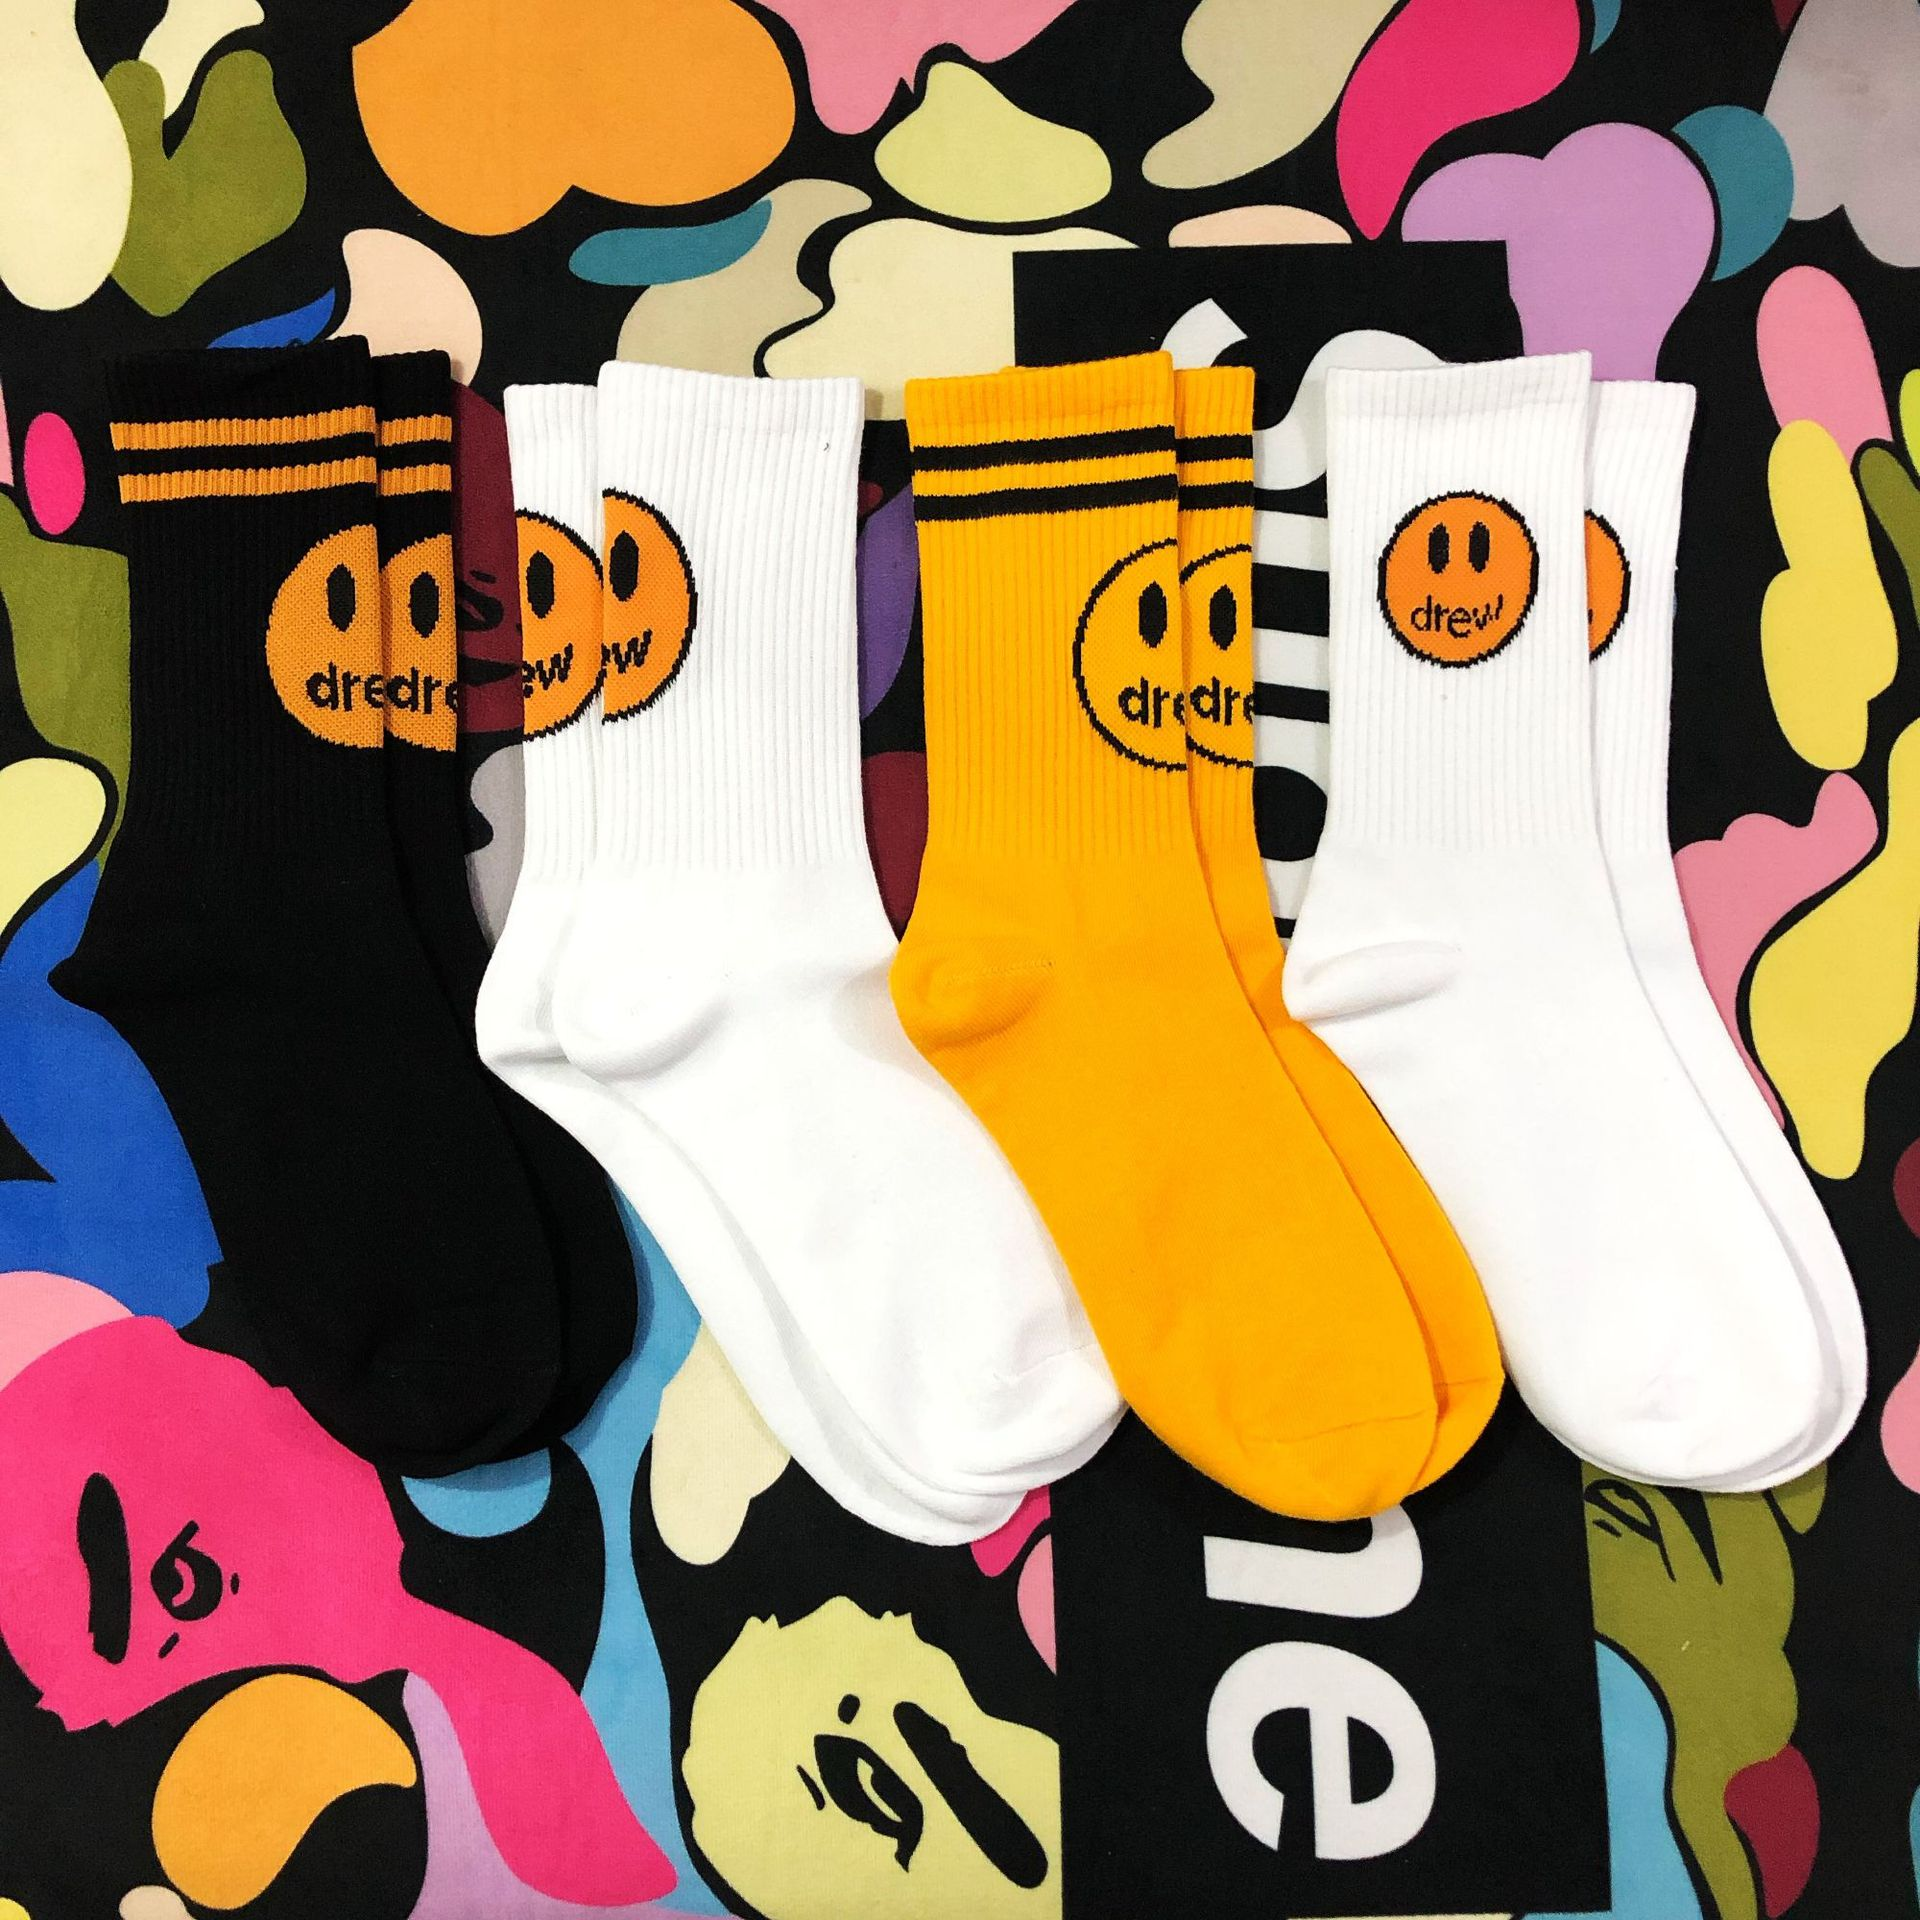 Dropshipping 2020 Adult Crew Drew House Justin Bieber Socks INS Street Fashion Hip Hop Mens Socks Funny Smile Soks Gifts For Men